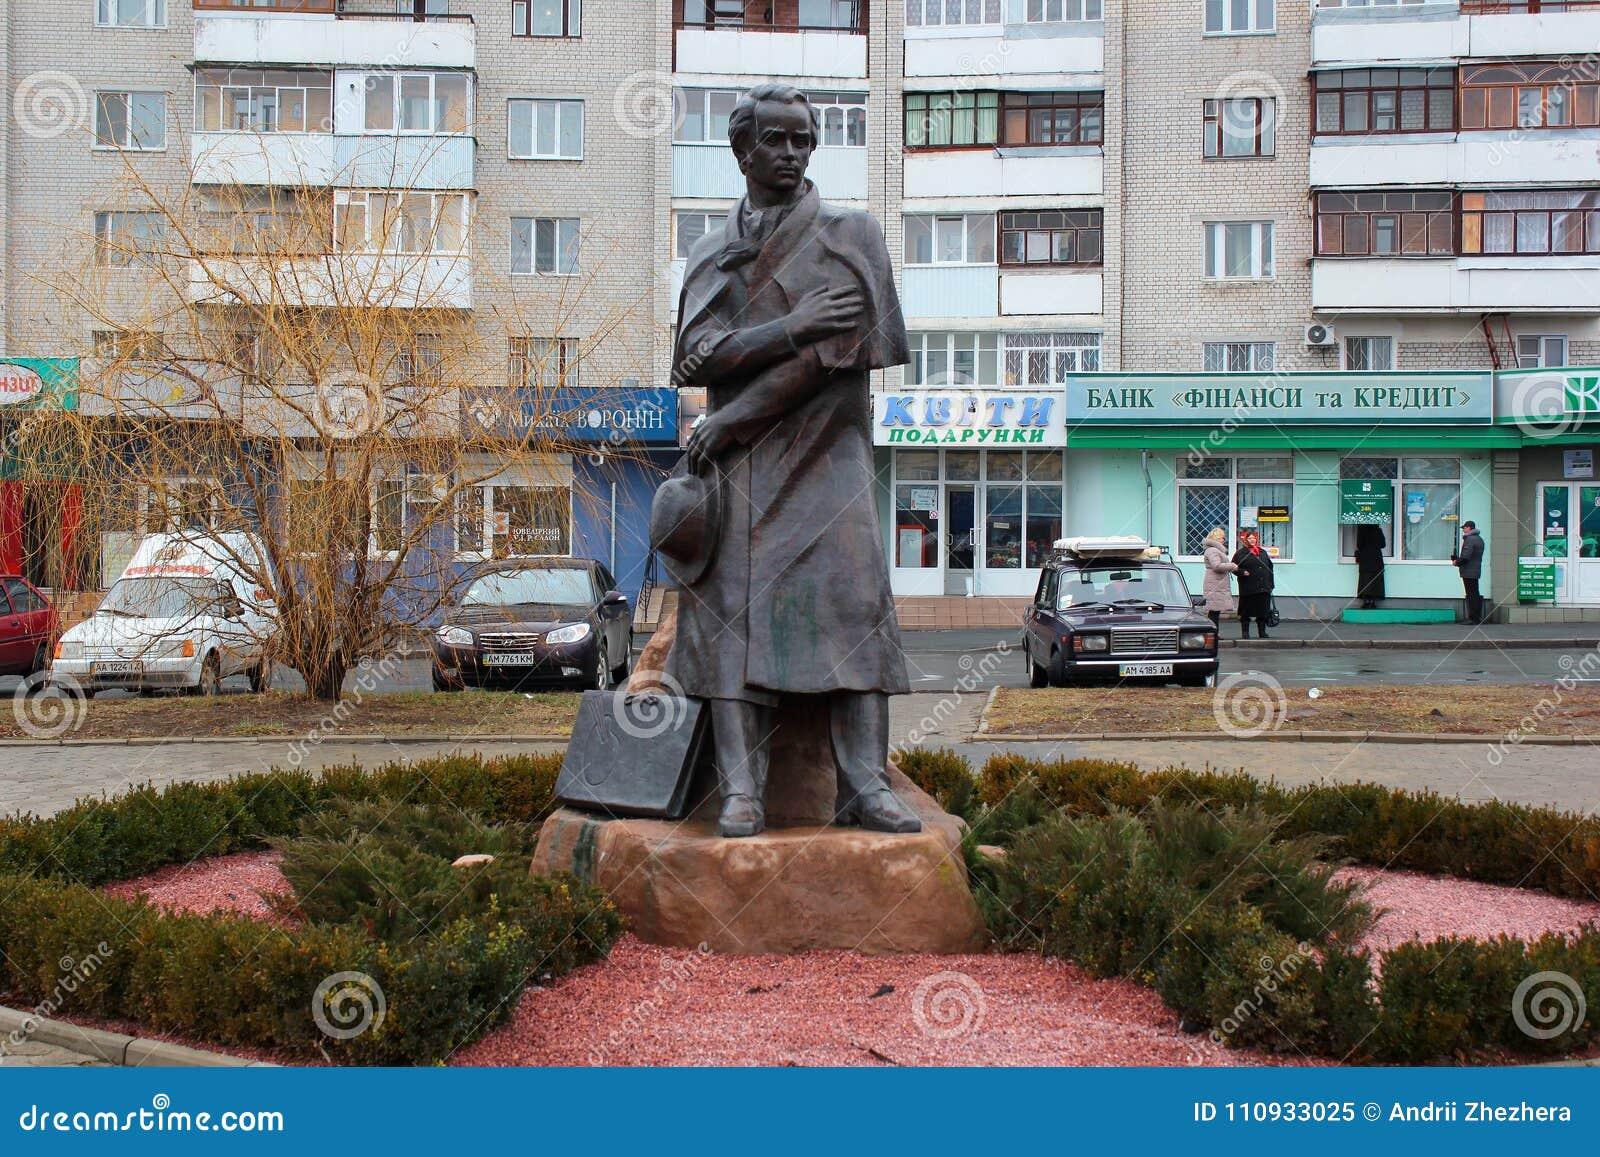 Meni thirteen minutes - Taras Shevchenko